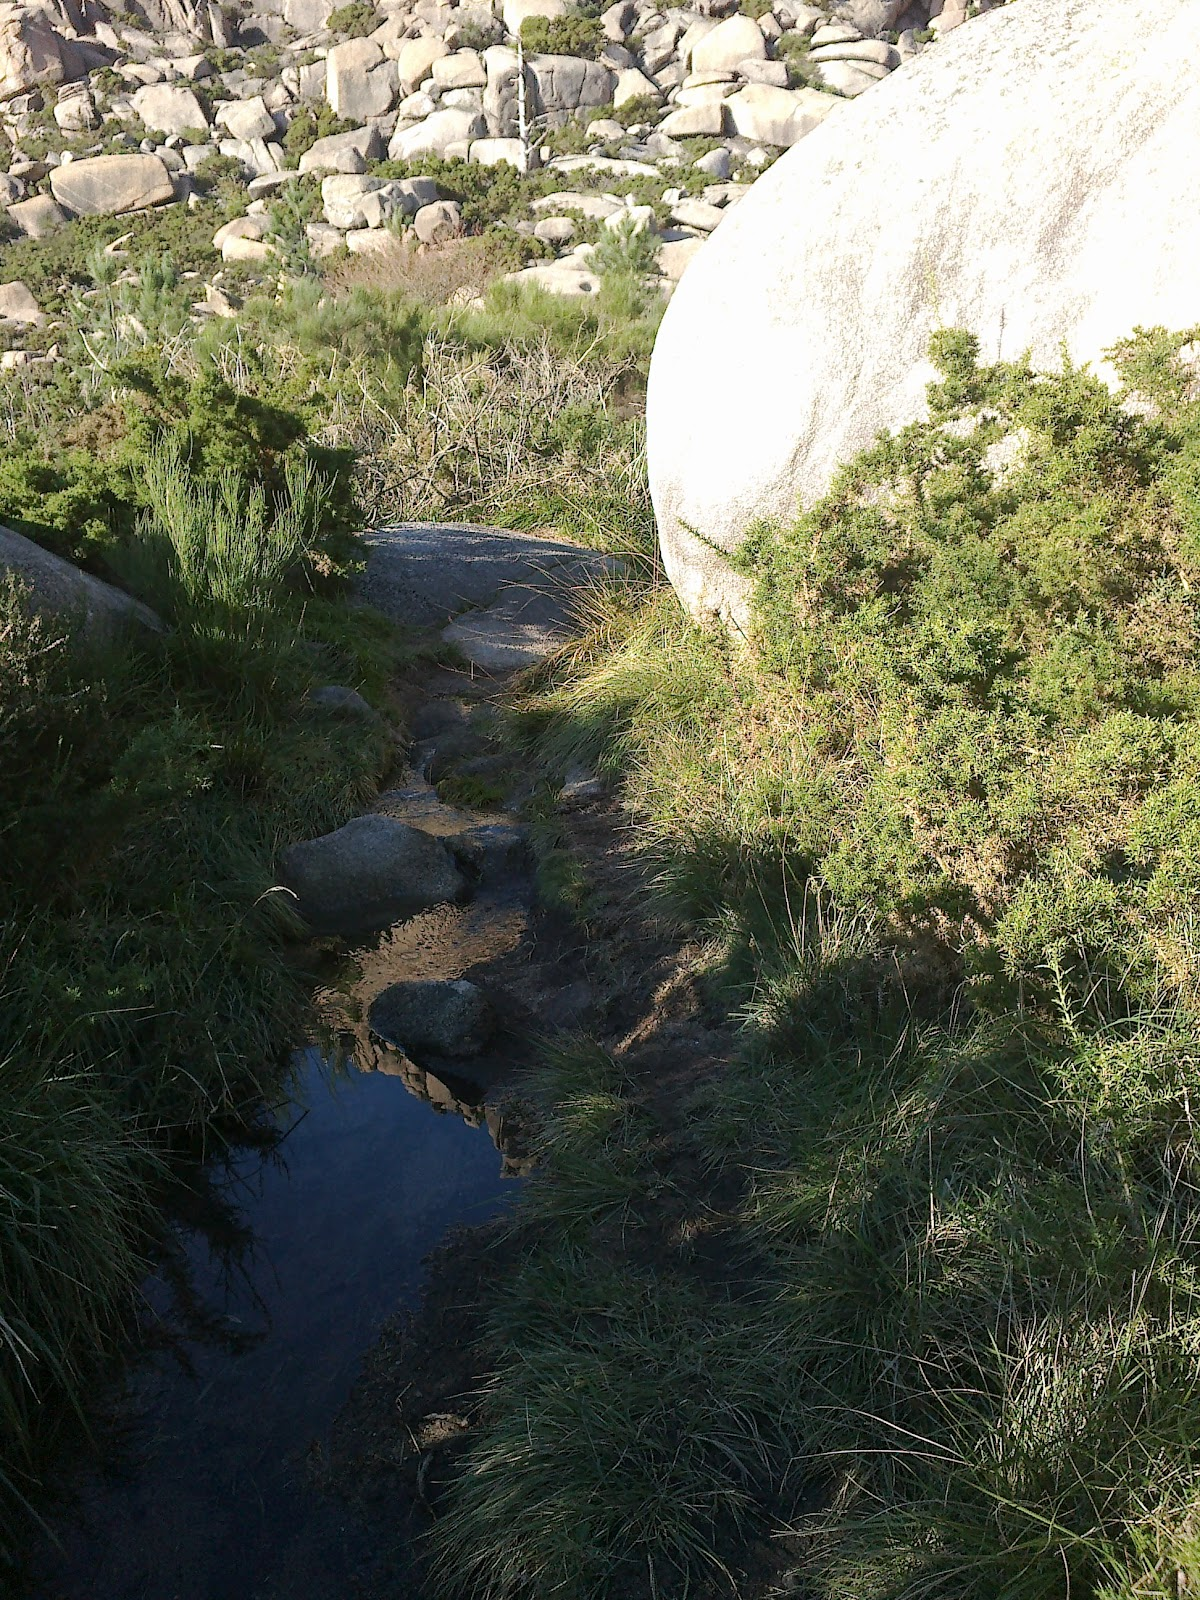 Sendero de ascenso al Monte Pindo